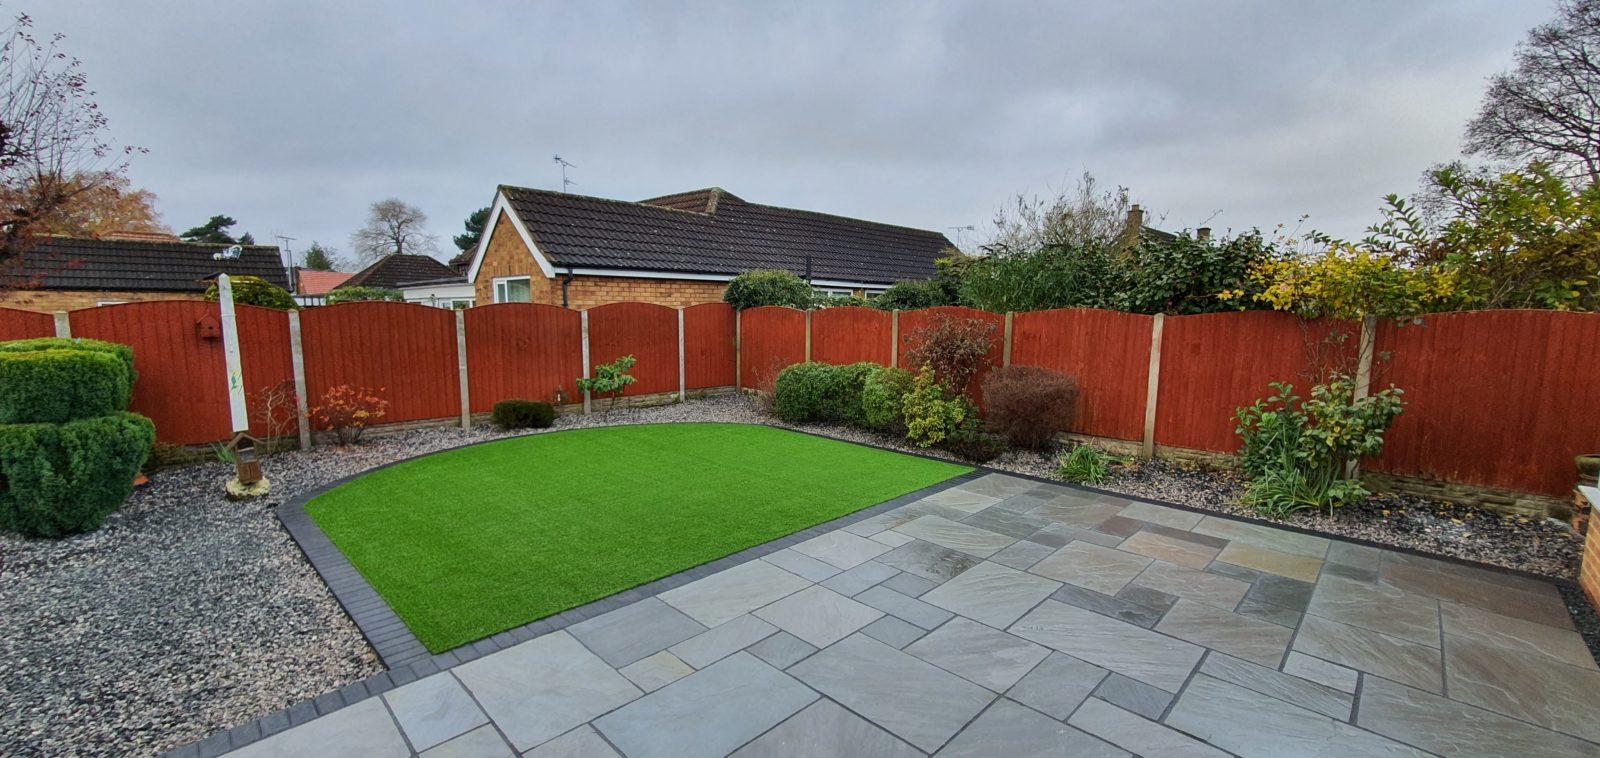 Landscape Design | Garden Services Yorkshire